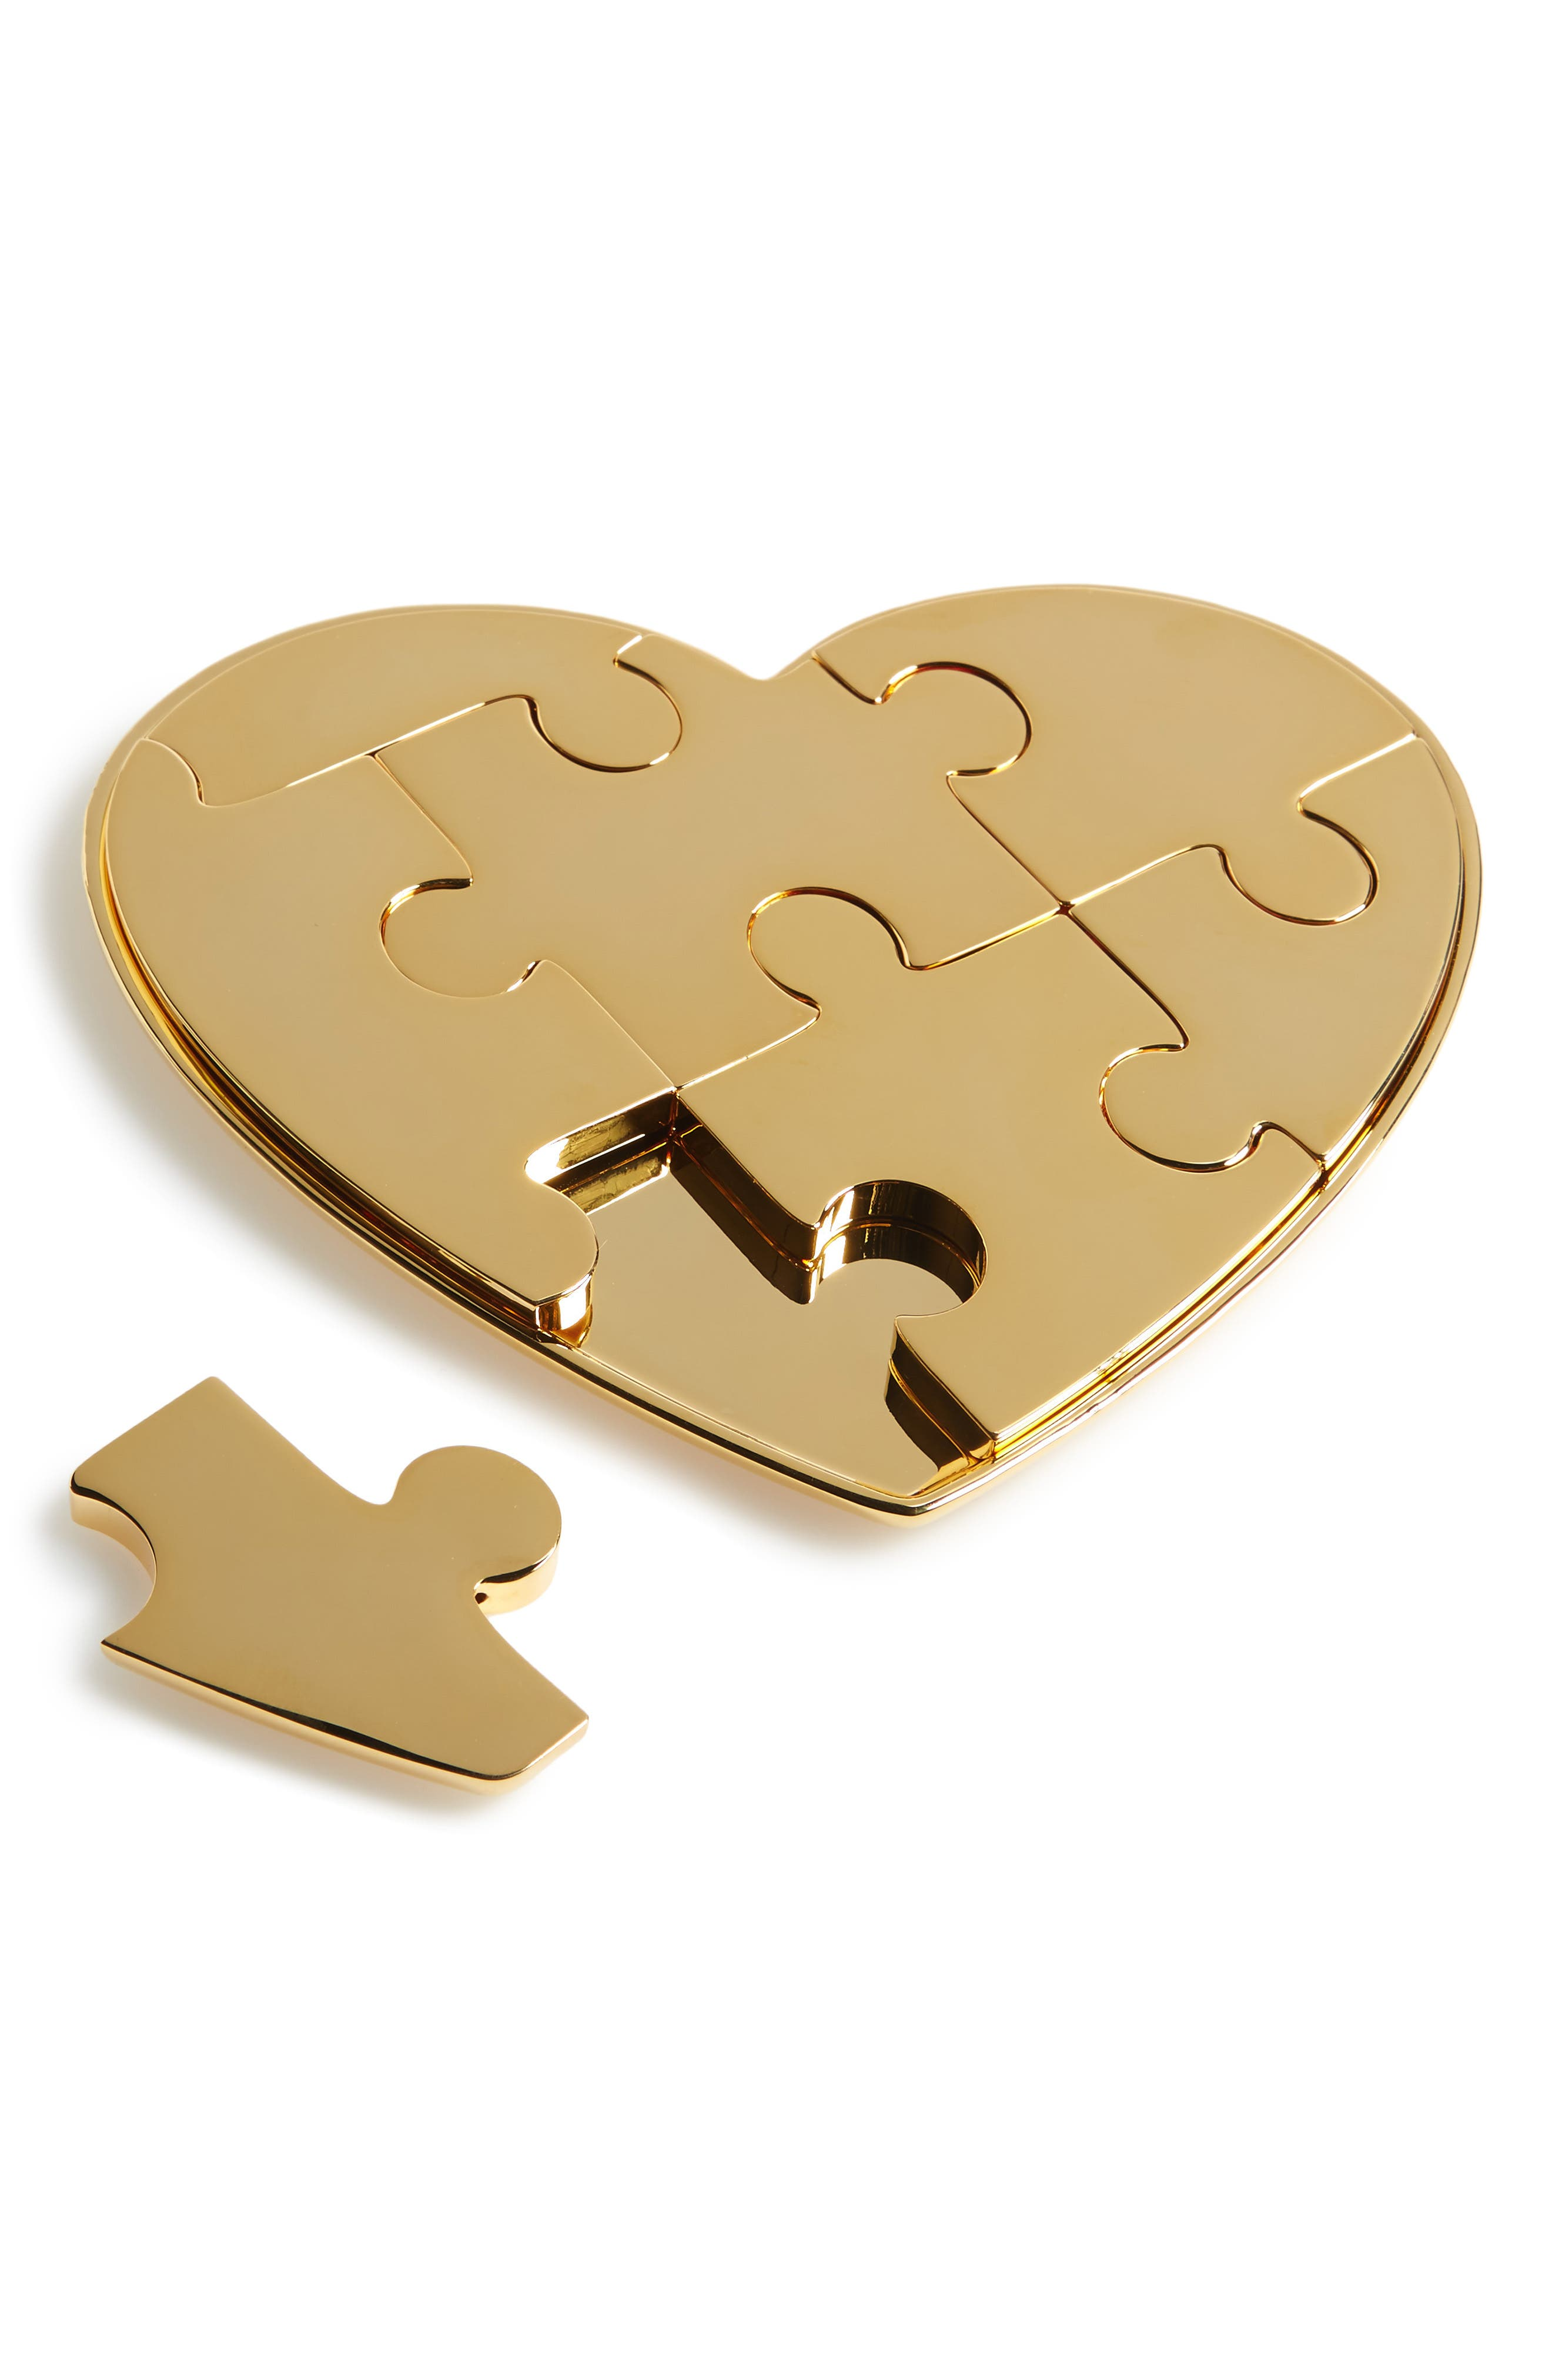 Main Image - AERIN Heart Jigsaw Puzzle